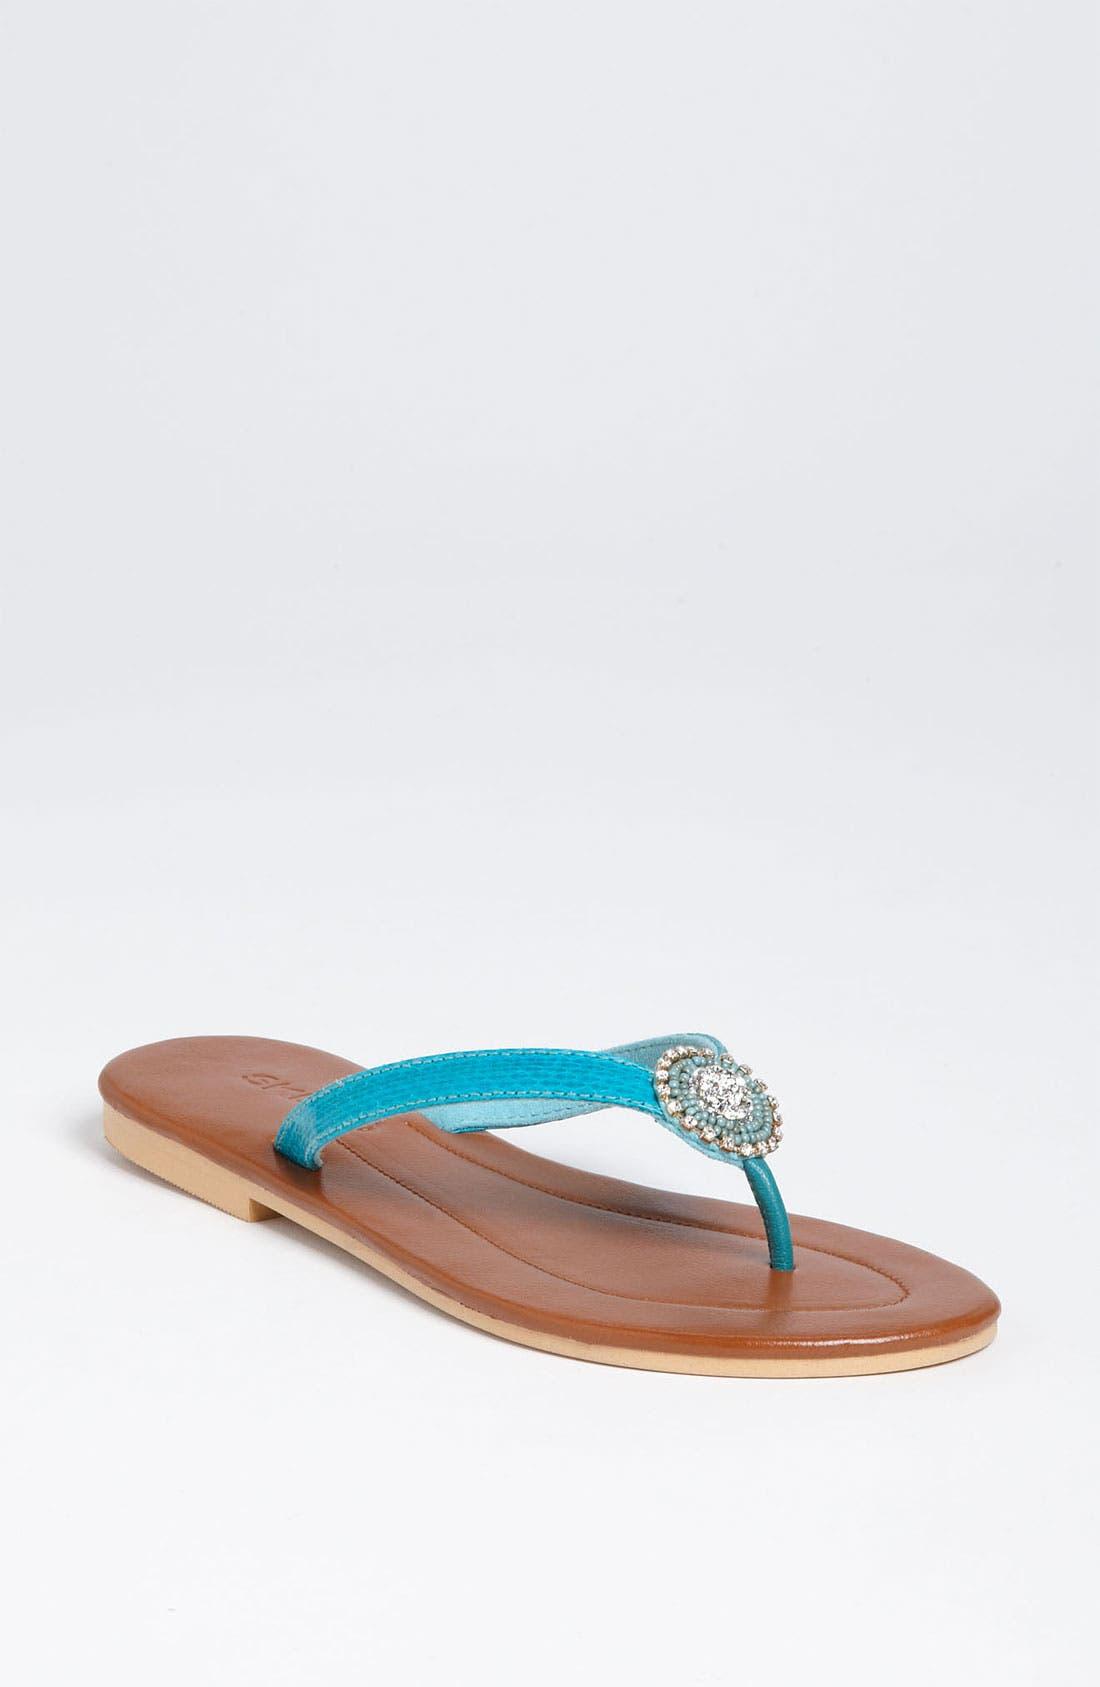 Main Image - Skemo 'Vela' Sandal